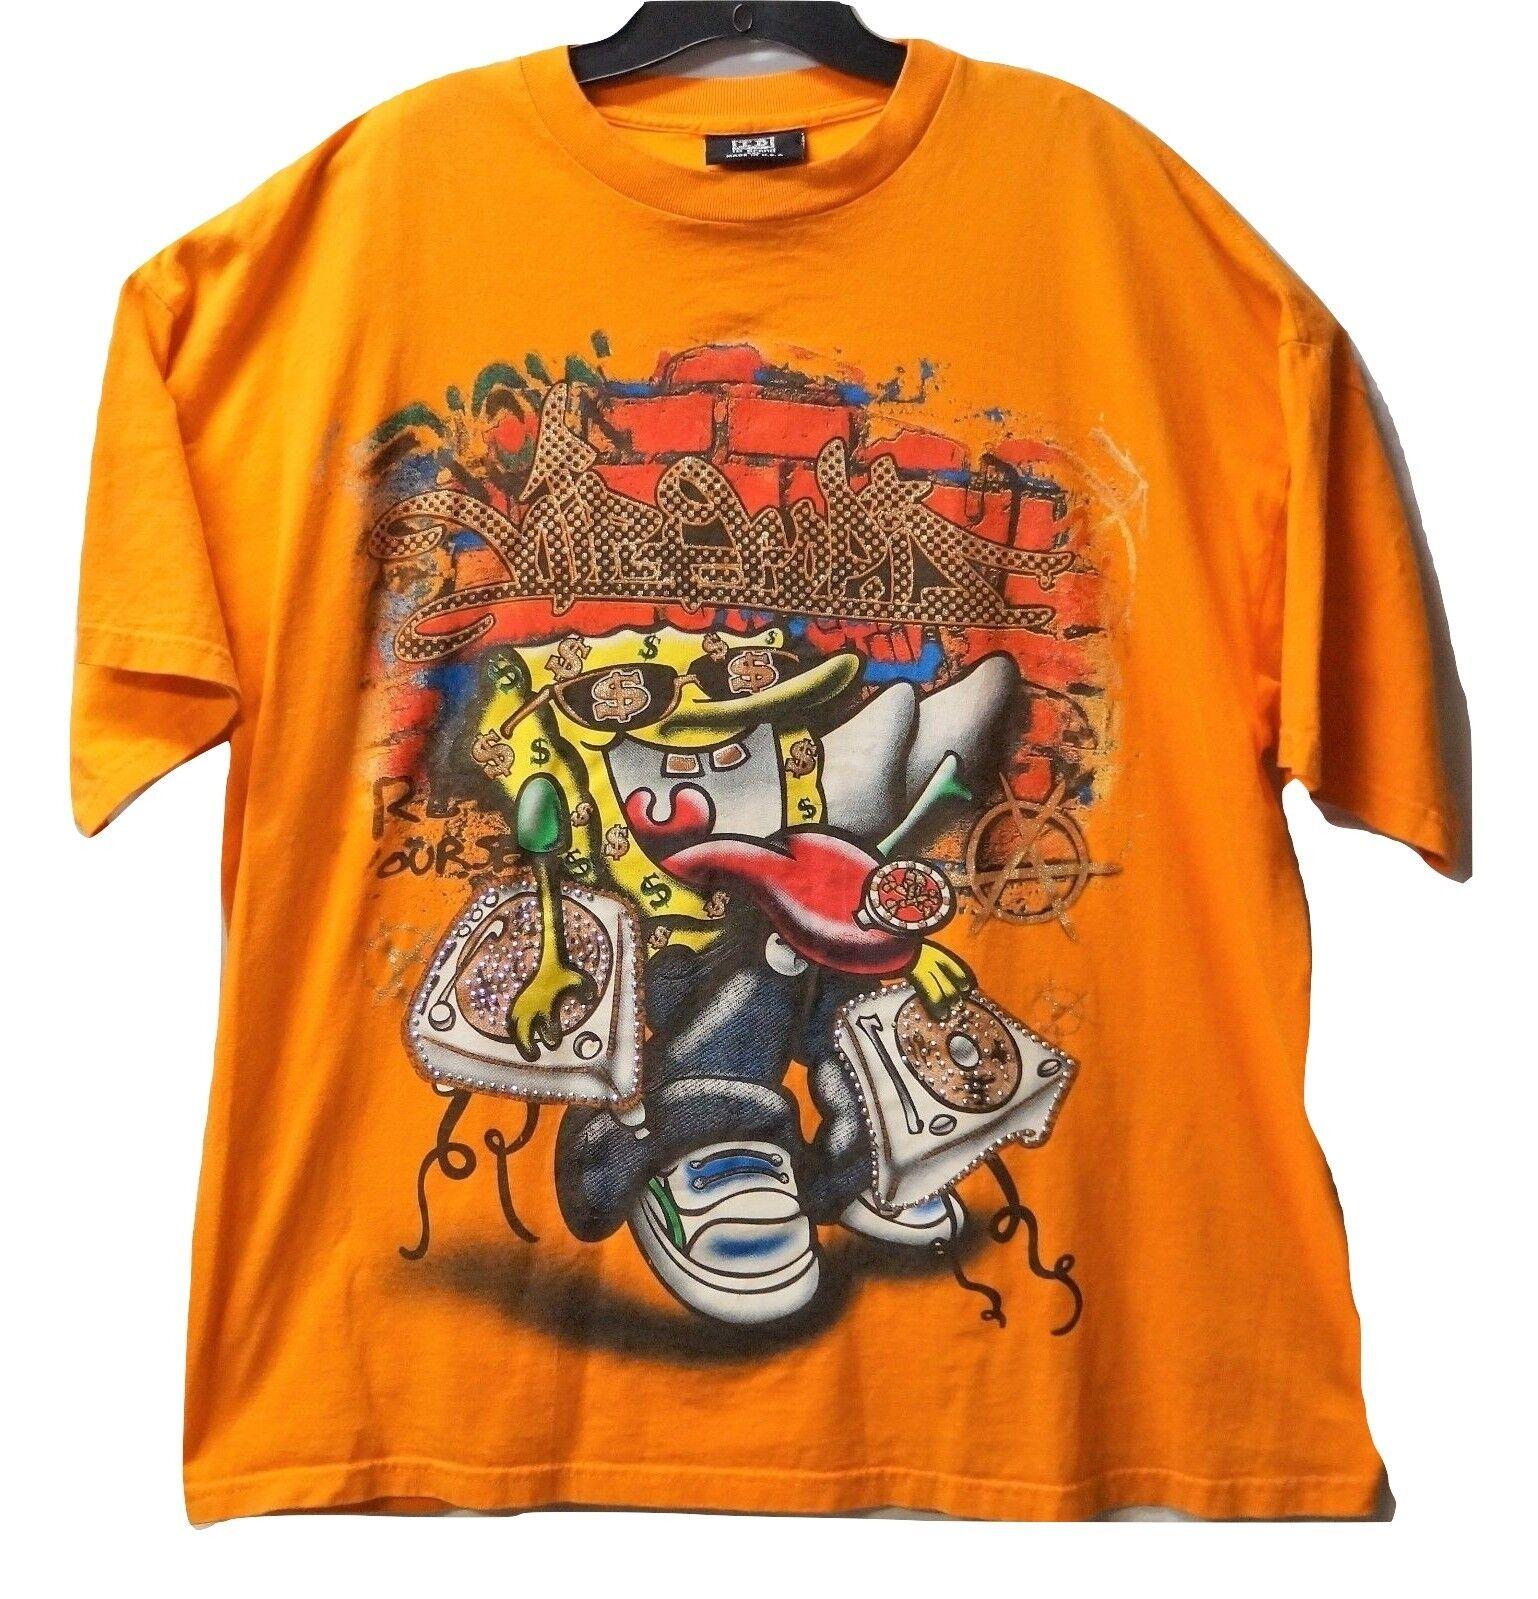 2XL Vintage 90s SPONGEBOB SQUAREPANTS Rap Hip Hop Shirt ID Brand Made In The USA